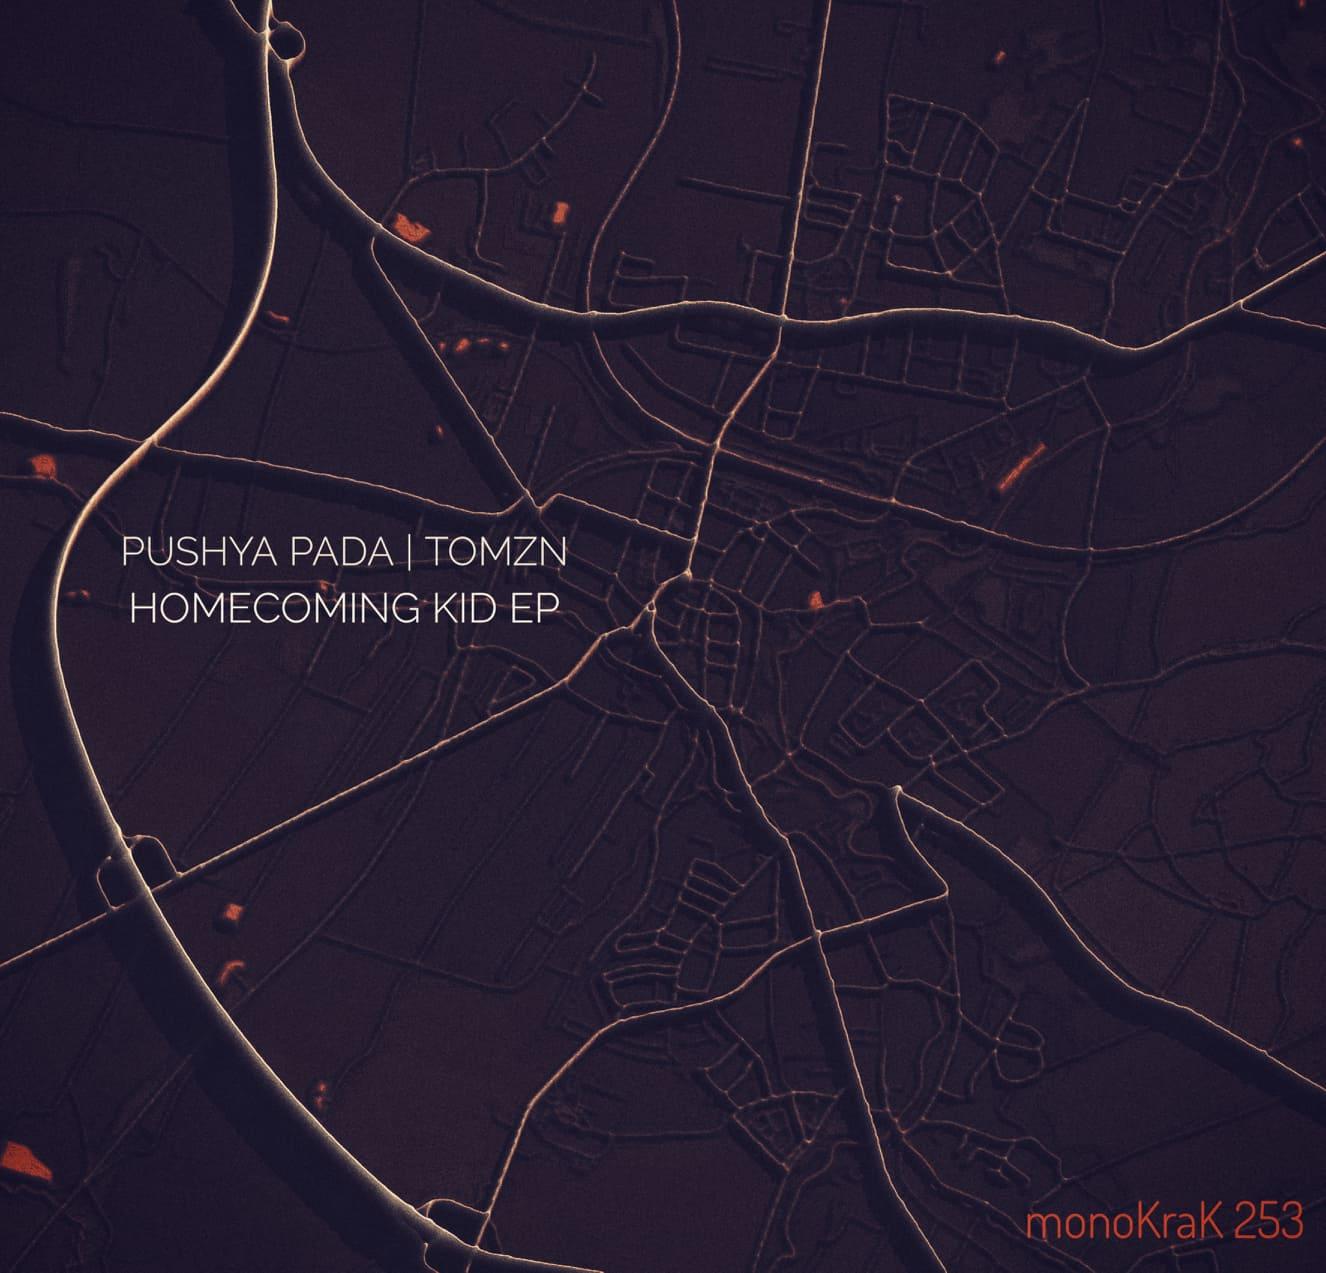 Pushya Pada & Tomzn – Homecoming Kid EP